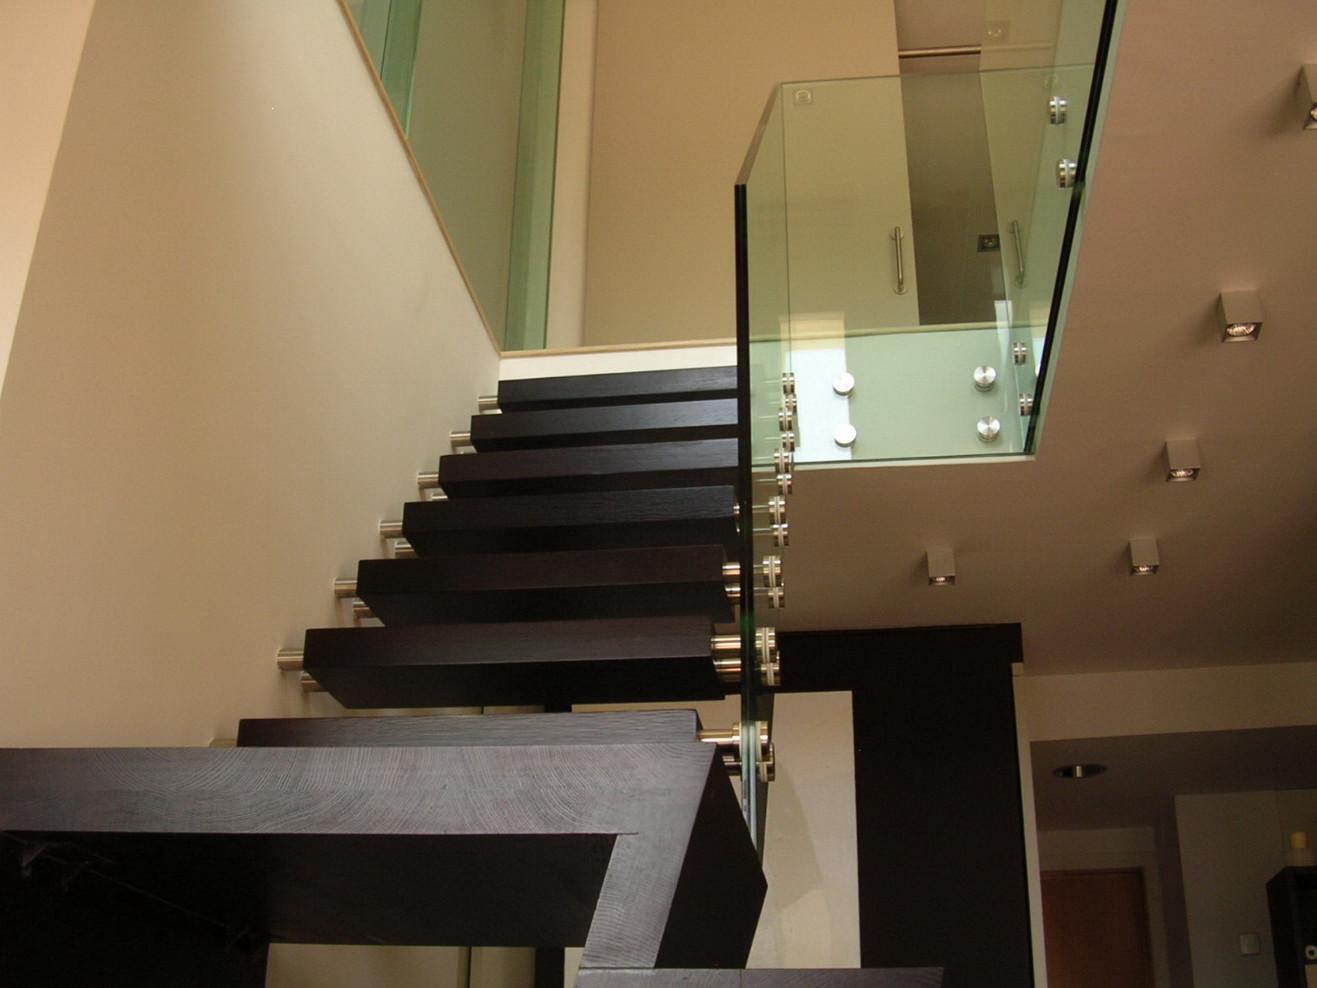 Escalera de vidrio en Terrassa